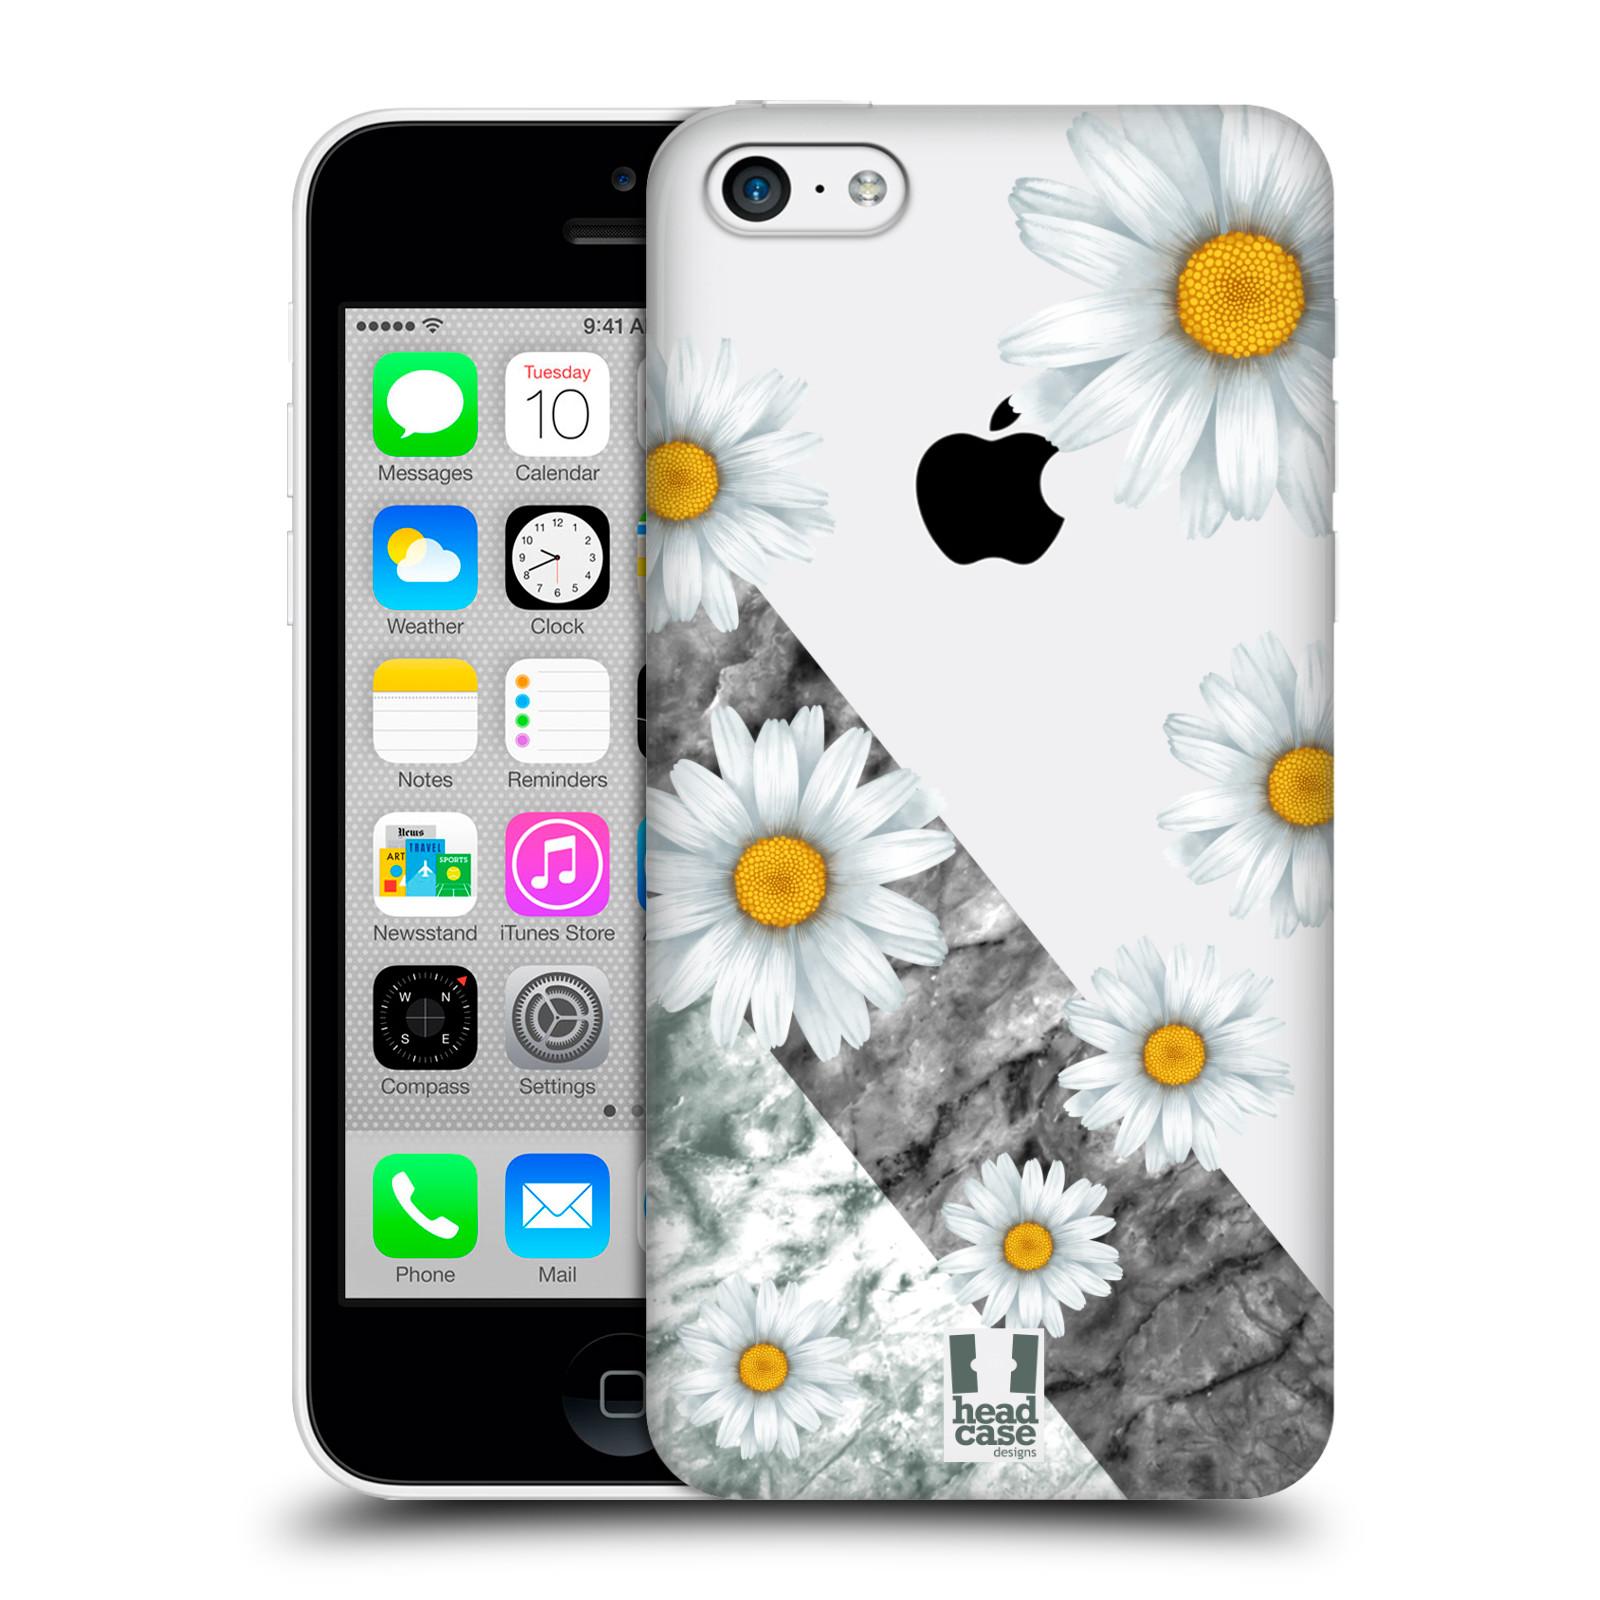 Plastové pouzdro na mobil Apple iPhone 5C - Head Case - Kopretiny a mramor